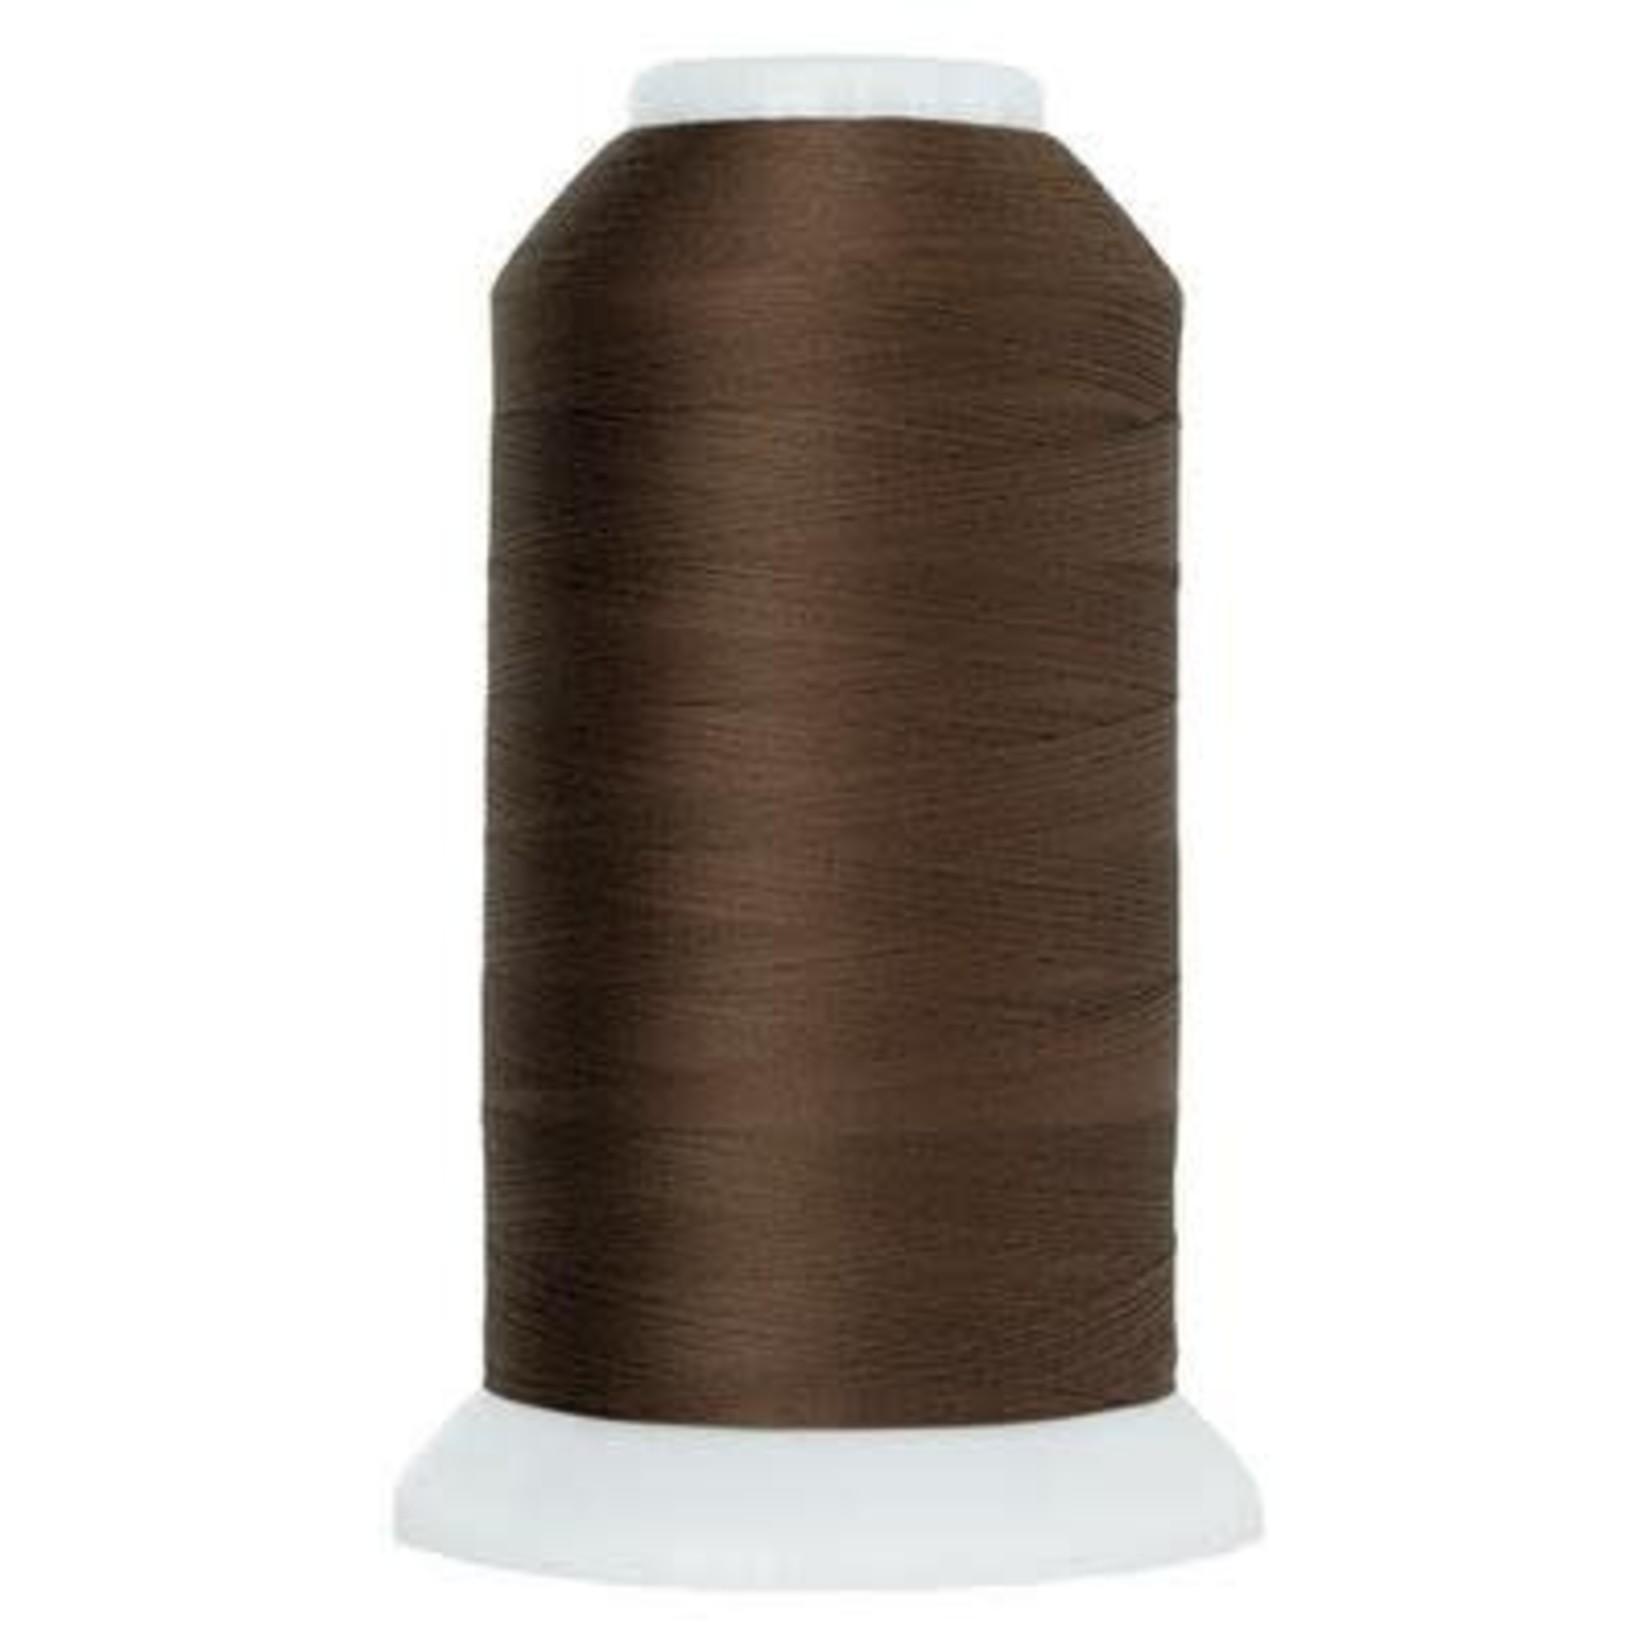 Superior Threads So Fine! 424 Chocolate 3280